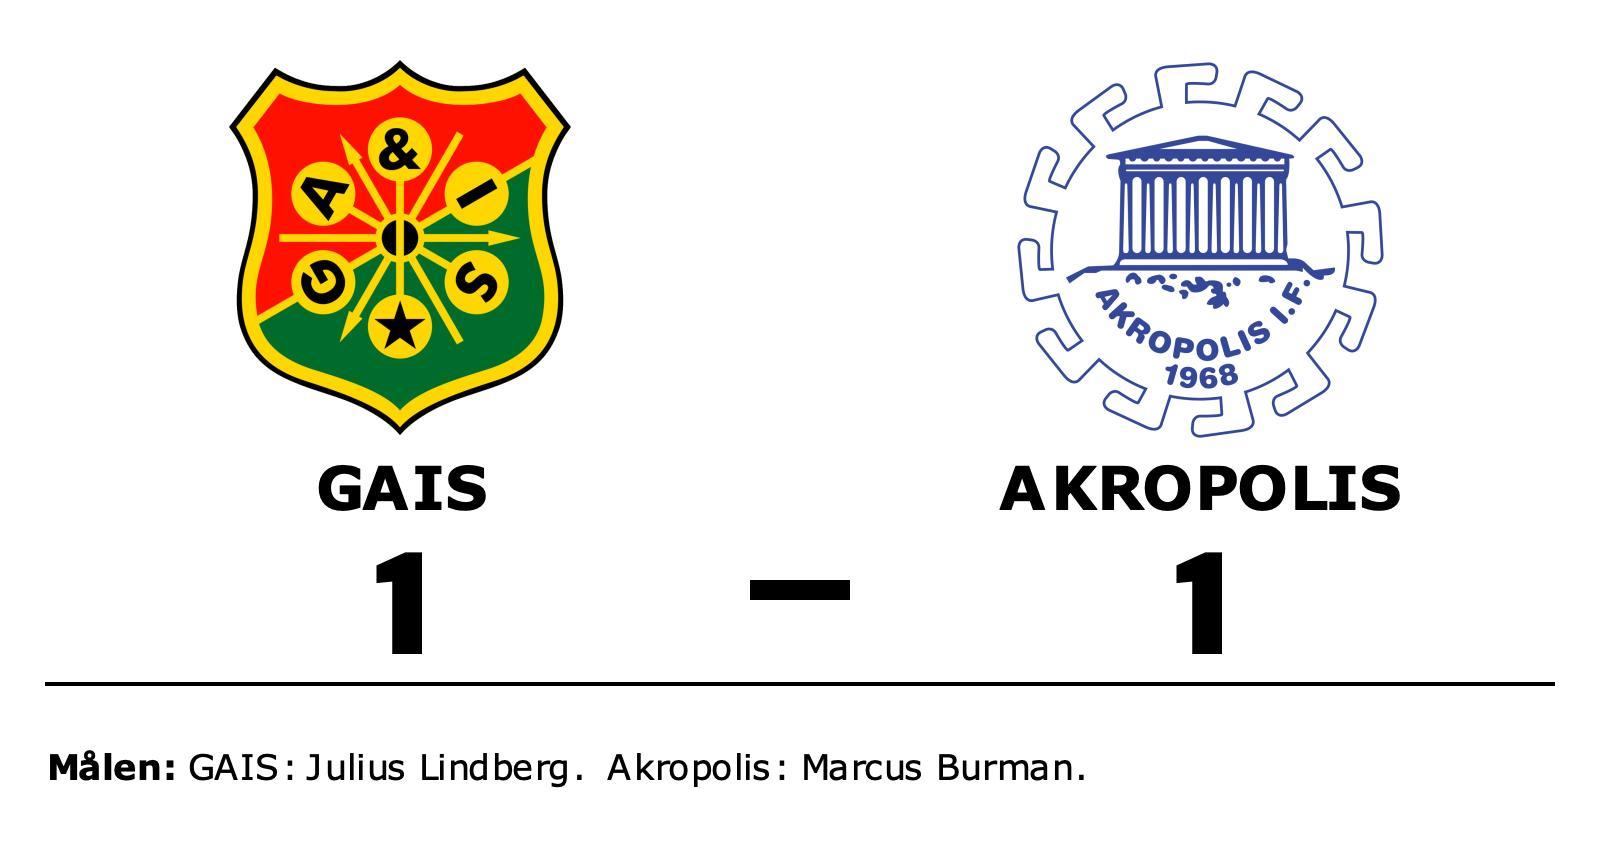 Marcus Burman räddade poäng när Akropolis kryssade mot GAIS